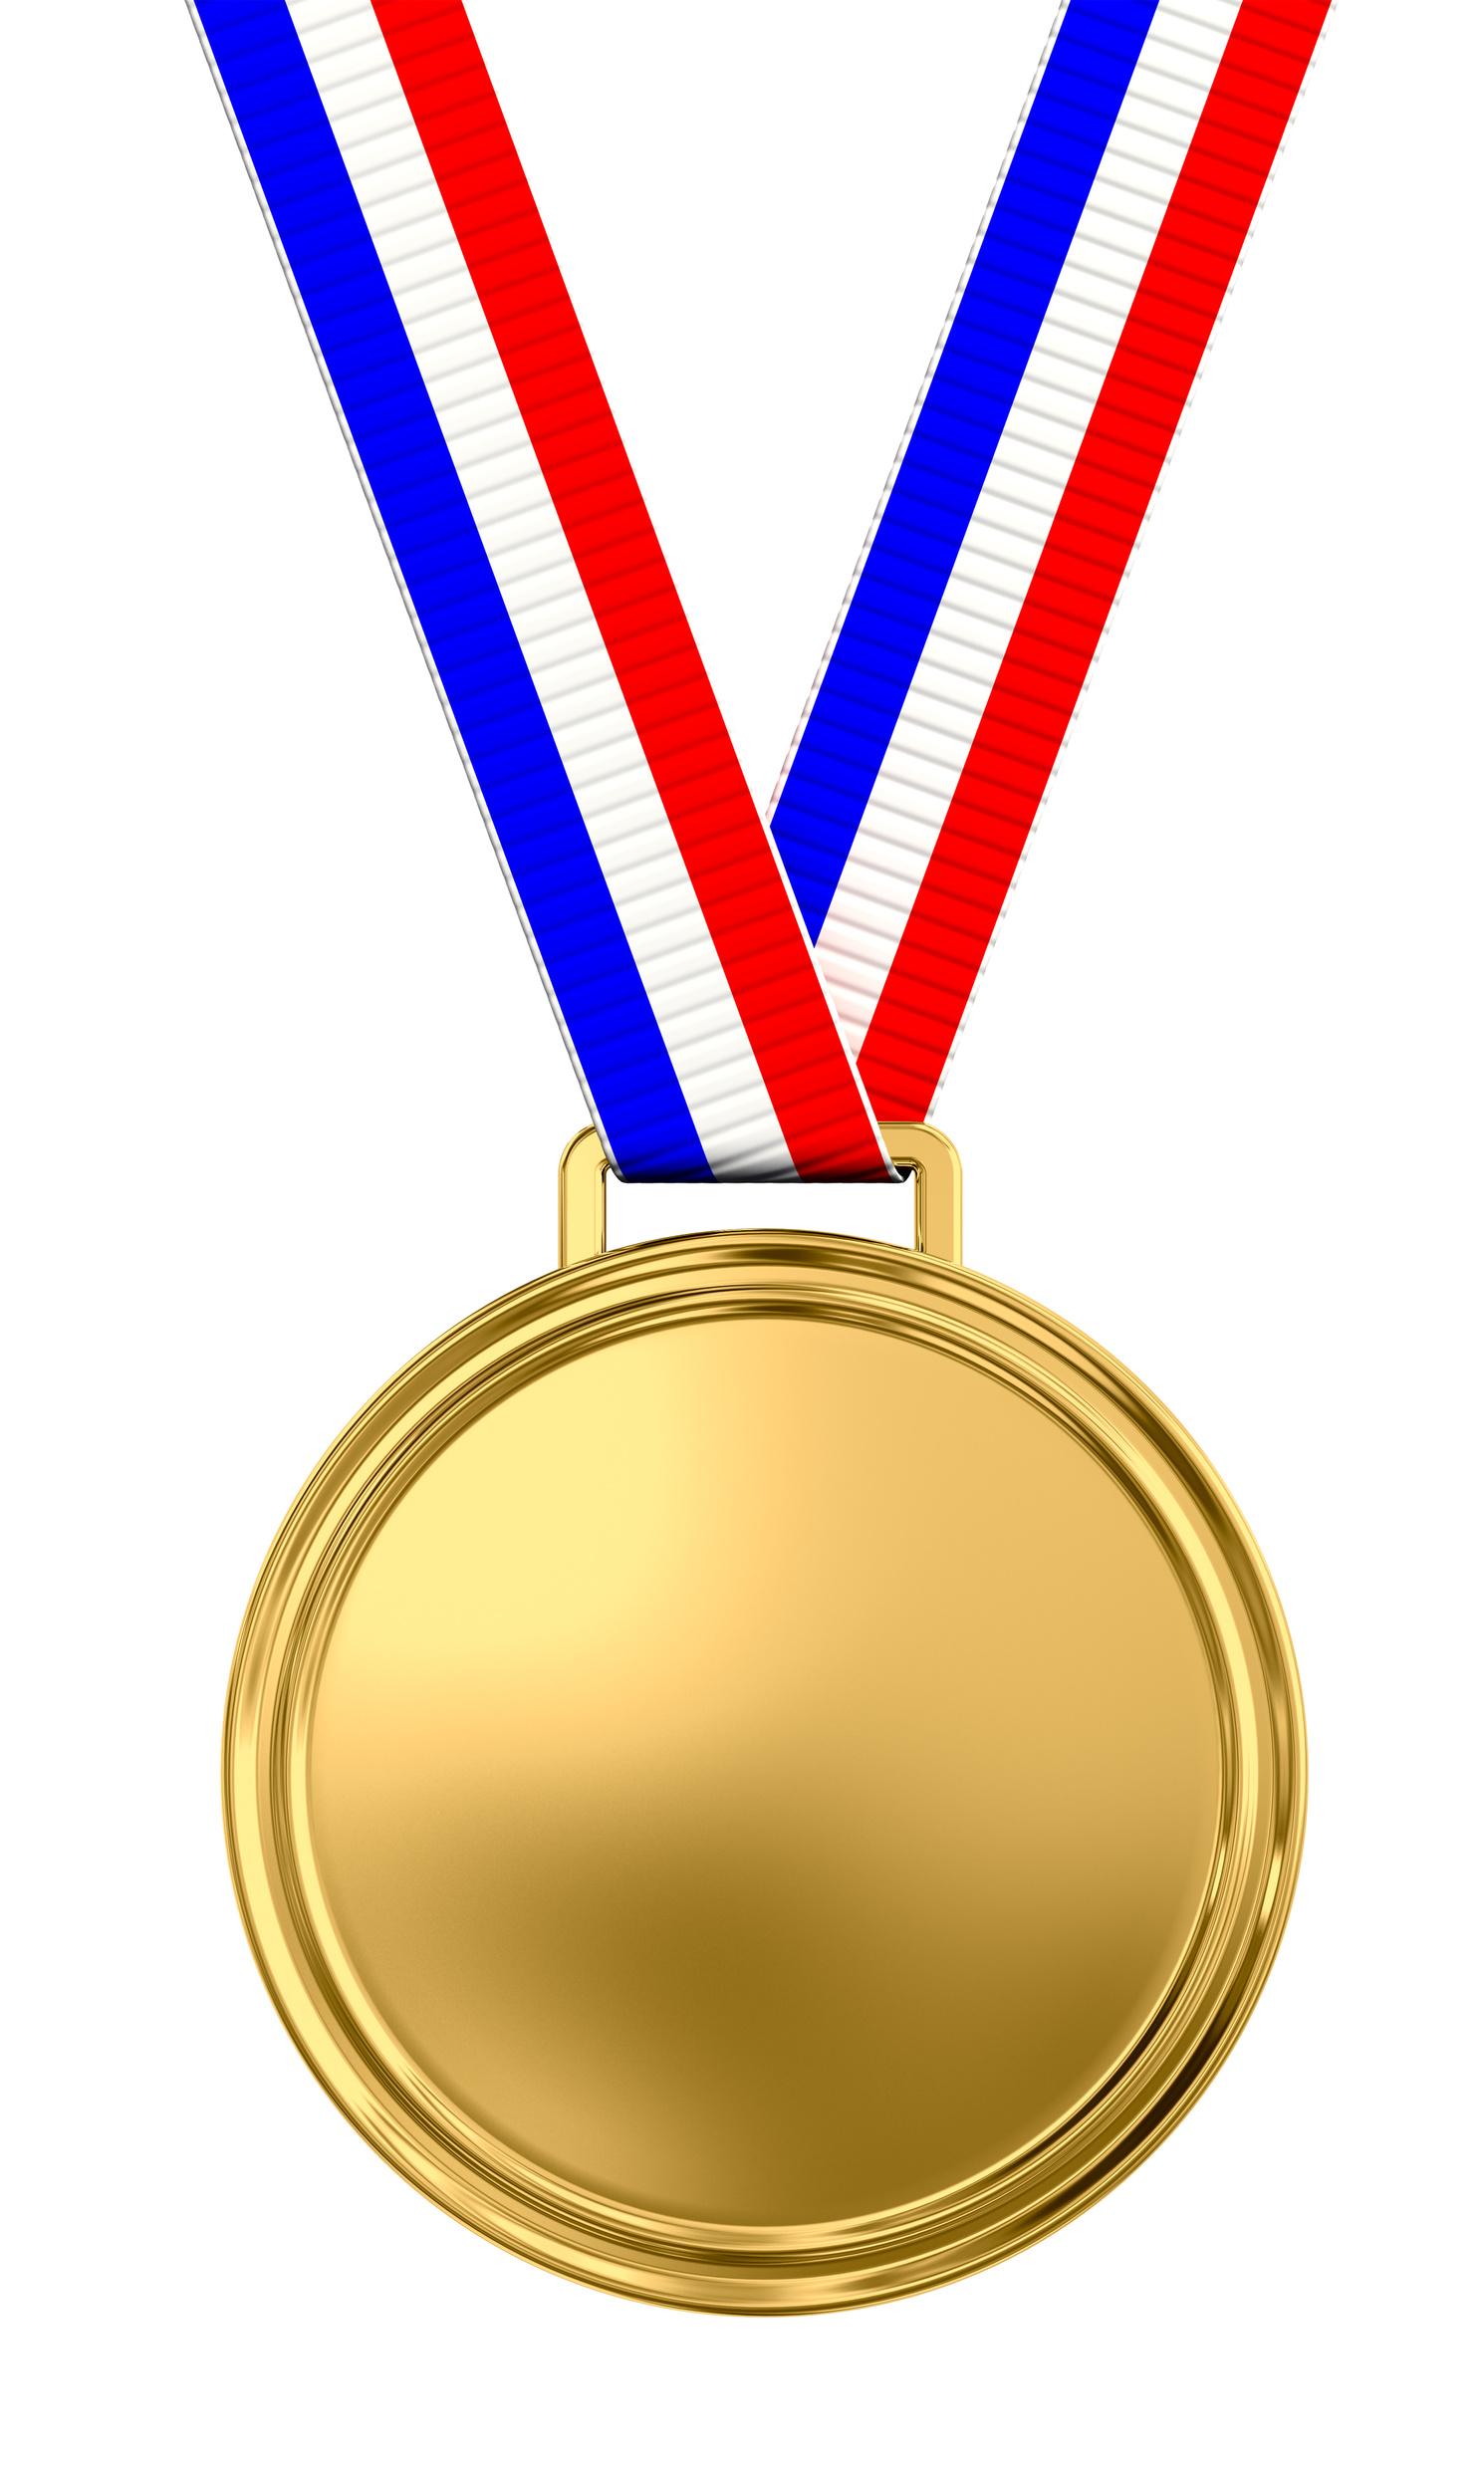 Gold Medal Clipart #1-Gold Medal Clipart #1-0